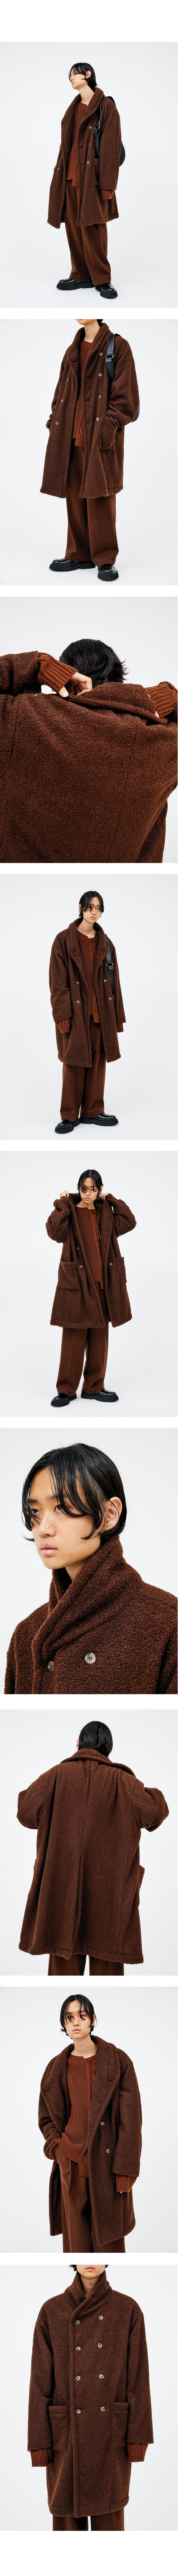 teddy bear coat - men